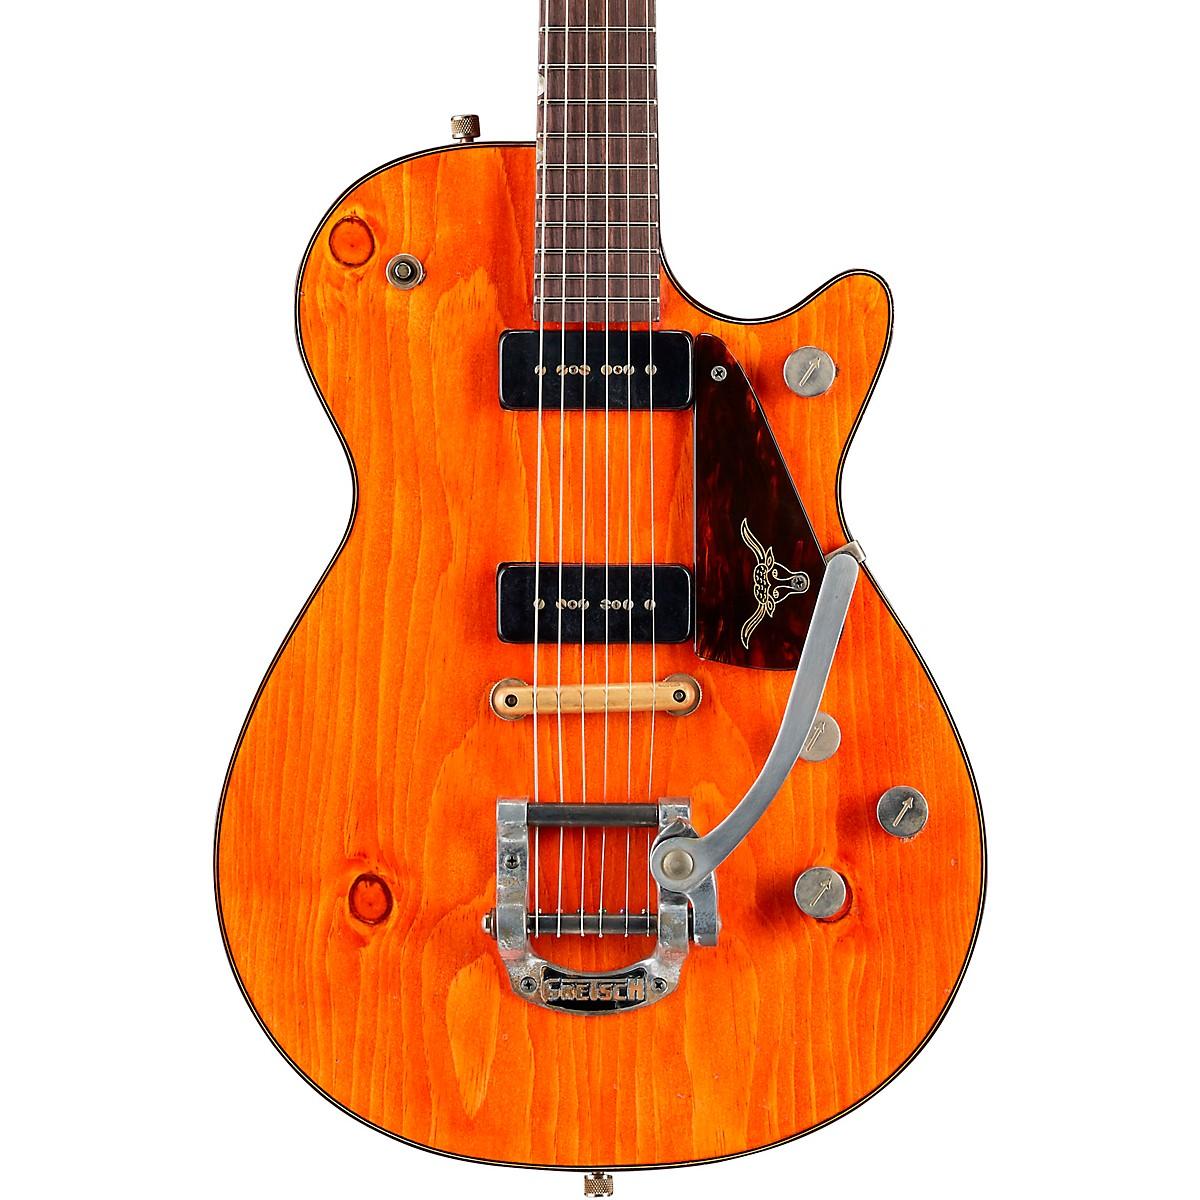 Gretsch Guitars G6210 Custom Shop Jr. Jet - Masterbuilt by Stephen Stern